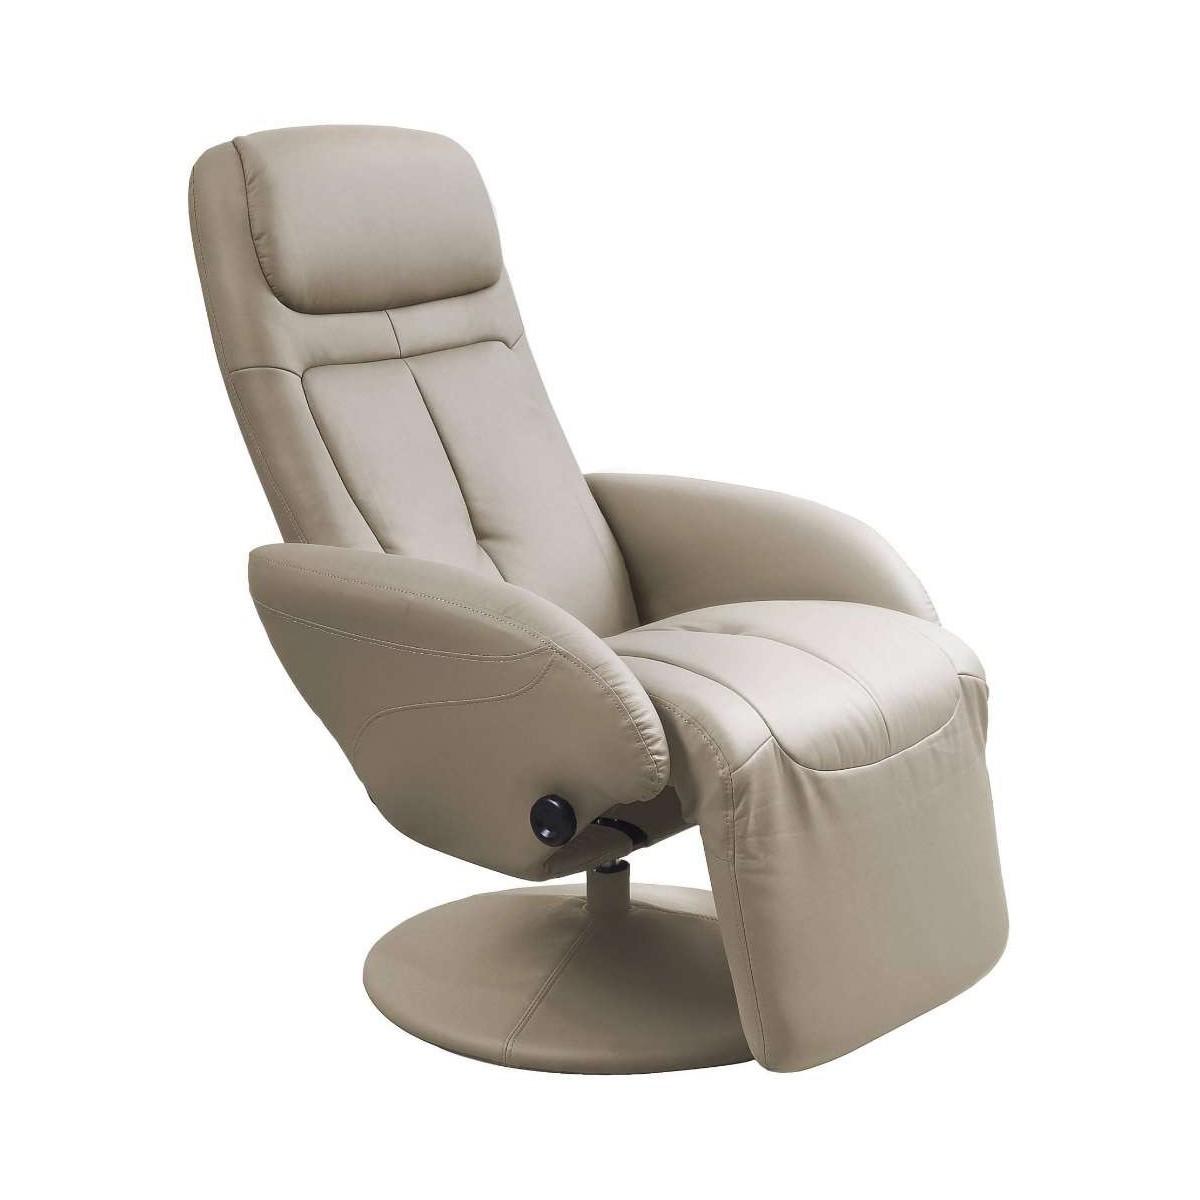 Optima cappucino fotel rozkładany